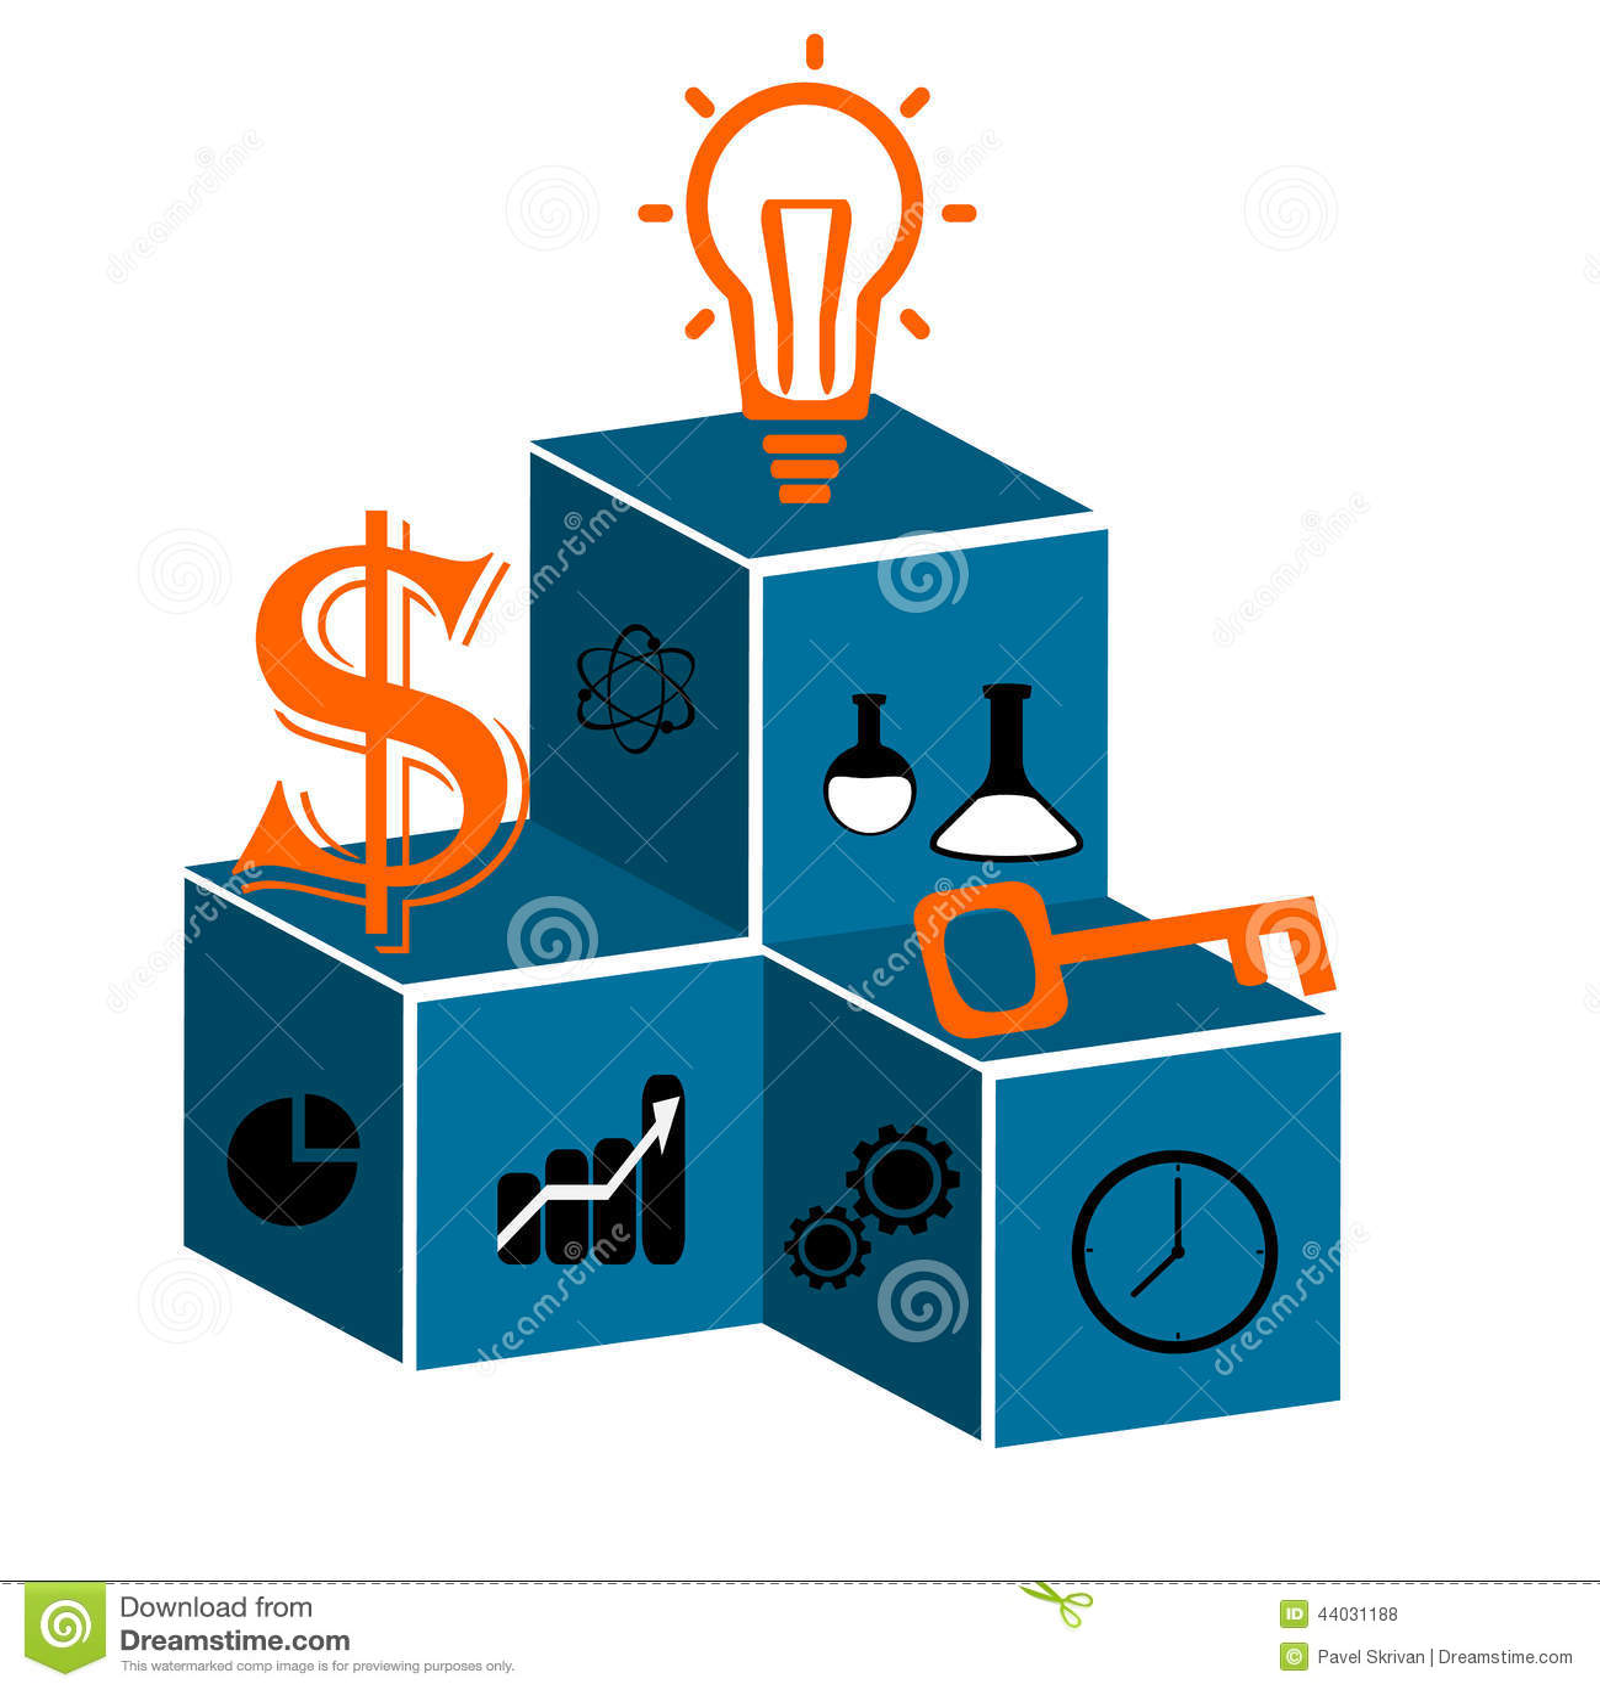 major operations of merchandising business plan